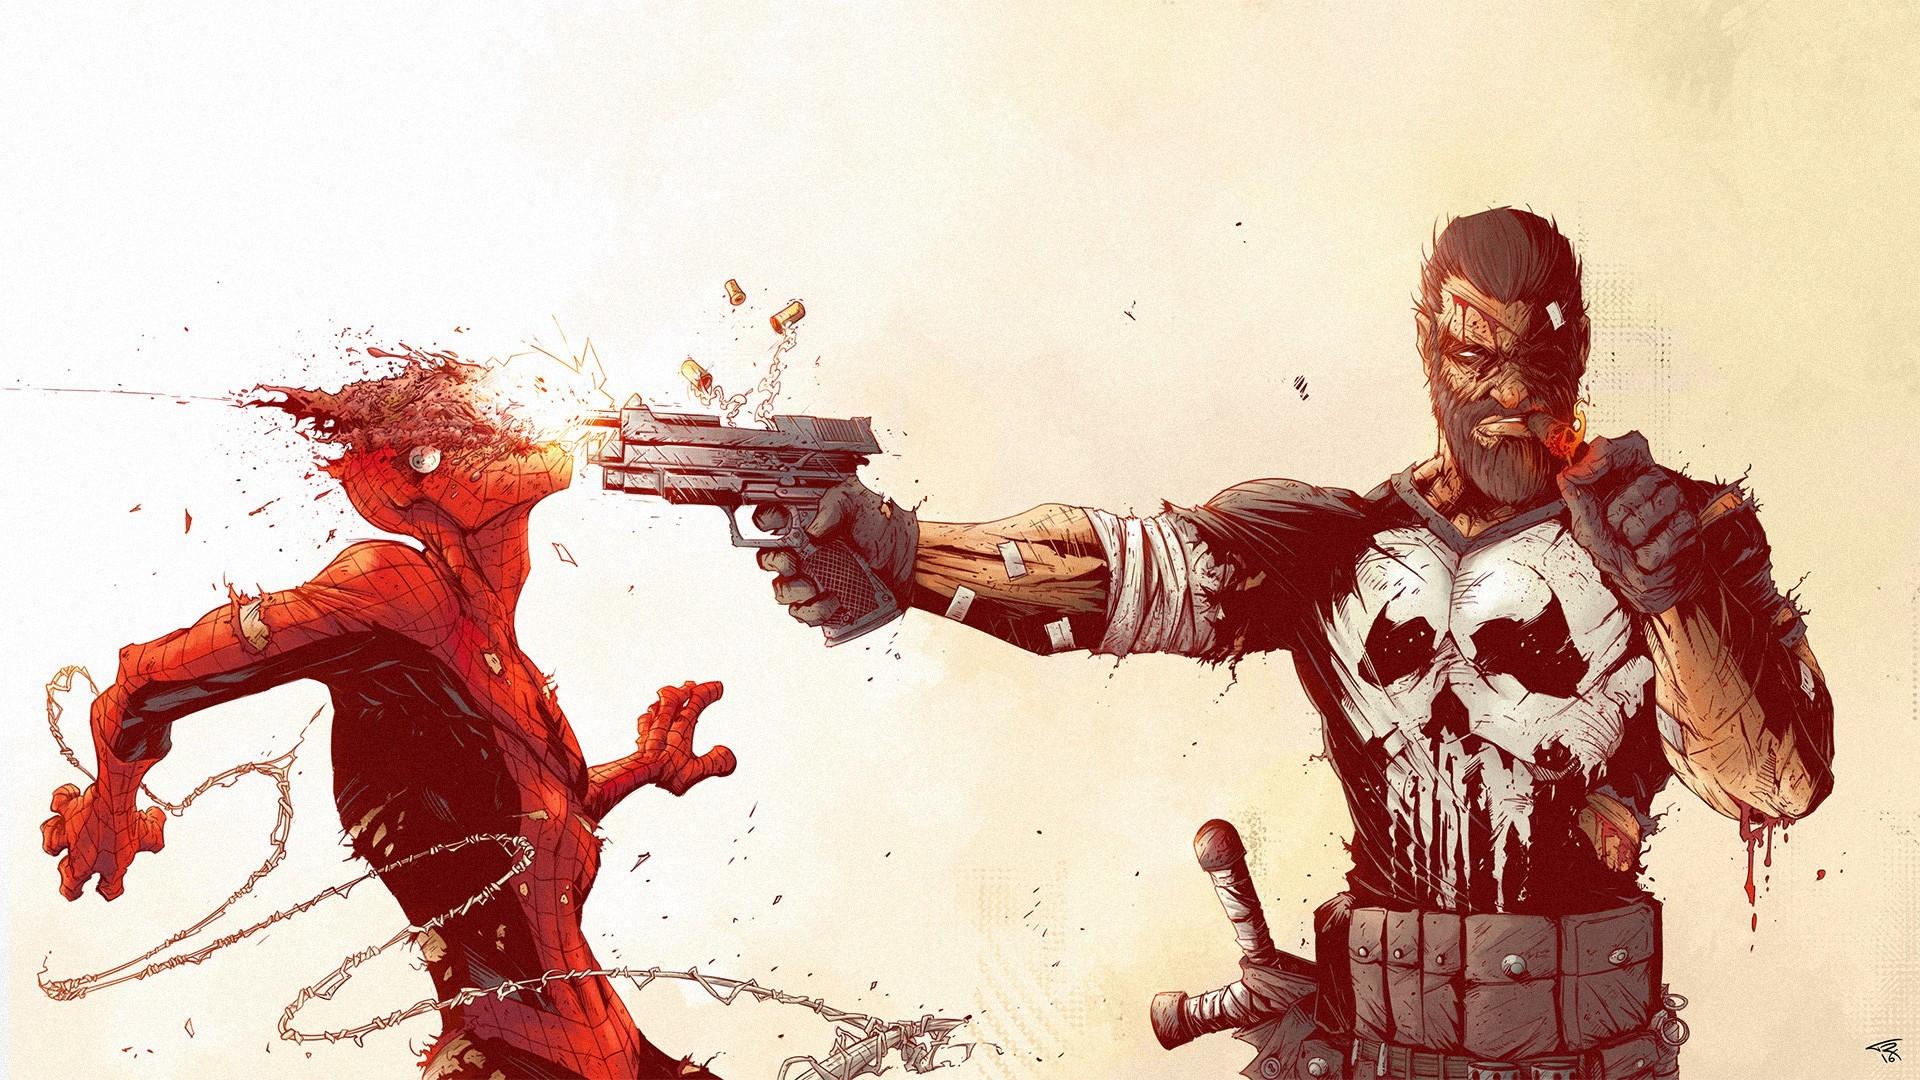 Best Wallpaper Marvel Punisher - illustration-gun-red-cartoon-Marvel-Comics-Spider-Man-comics-The-Punisher-sketch-266895  2018_437366.jpg